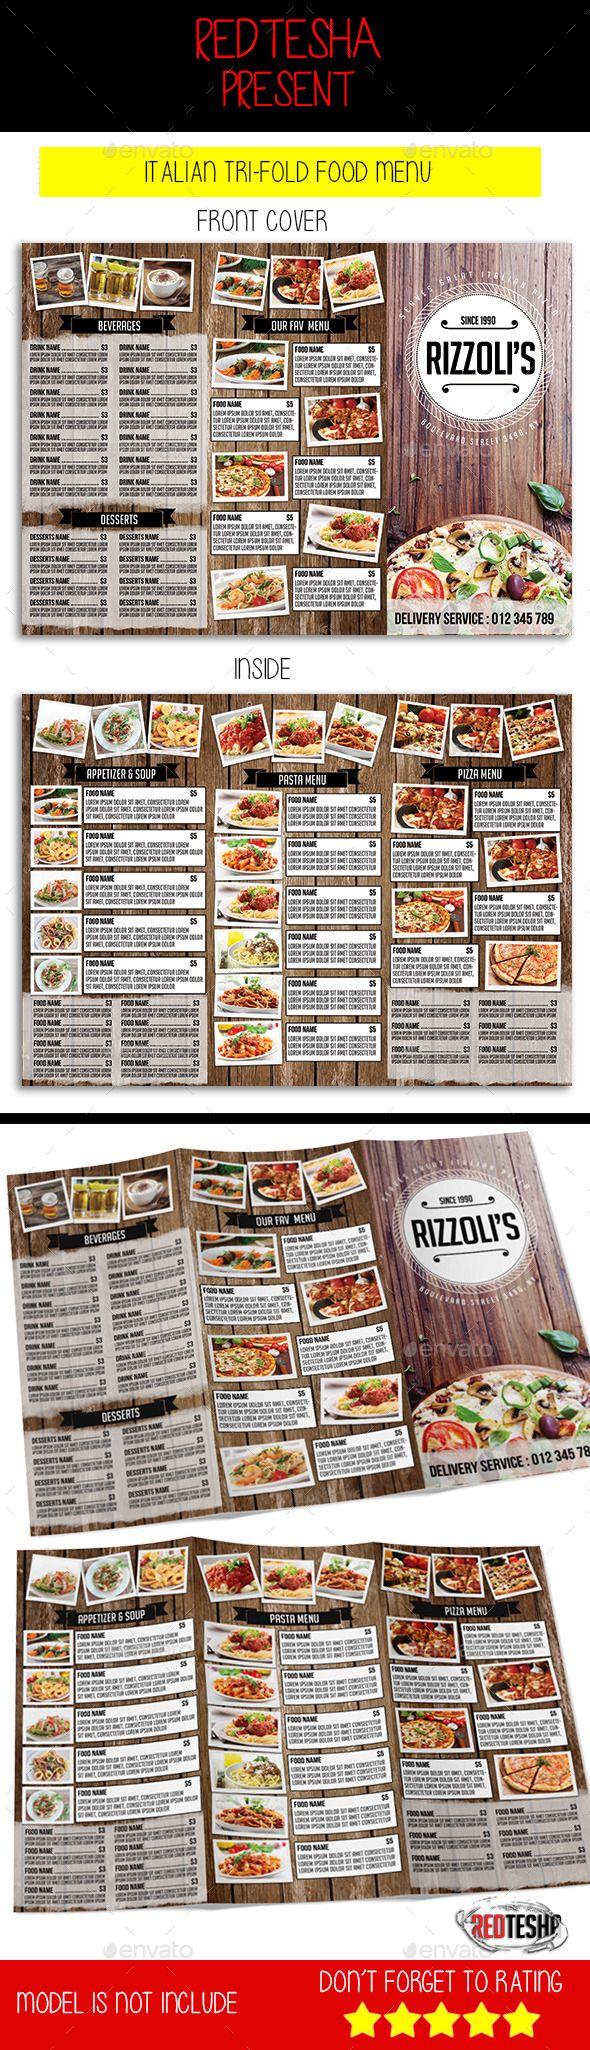 Italian tri fold menu menu templates template and food menu template italian restaurant or cafe tri fold menu template design download http maxwellsz